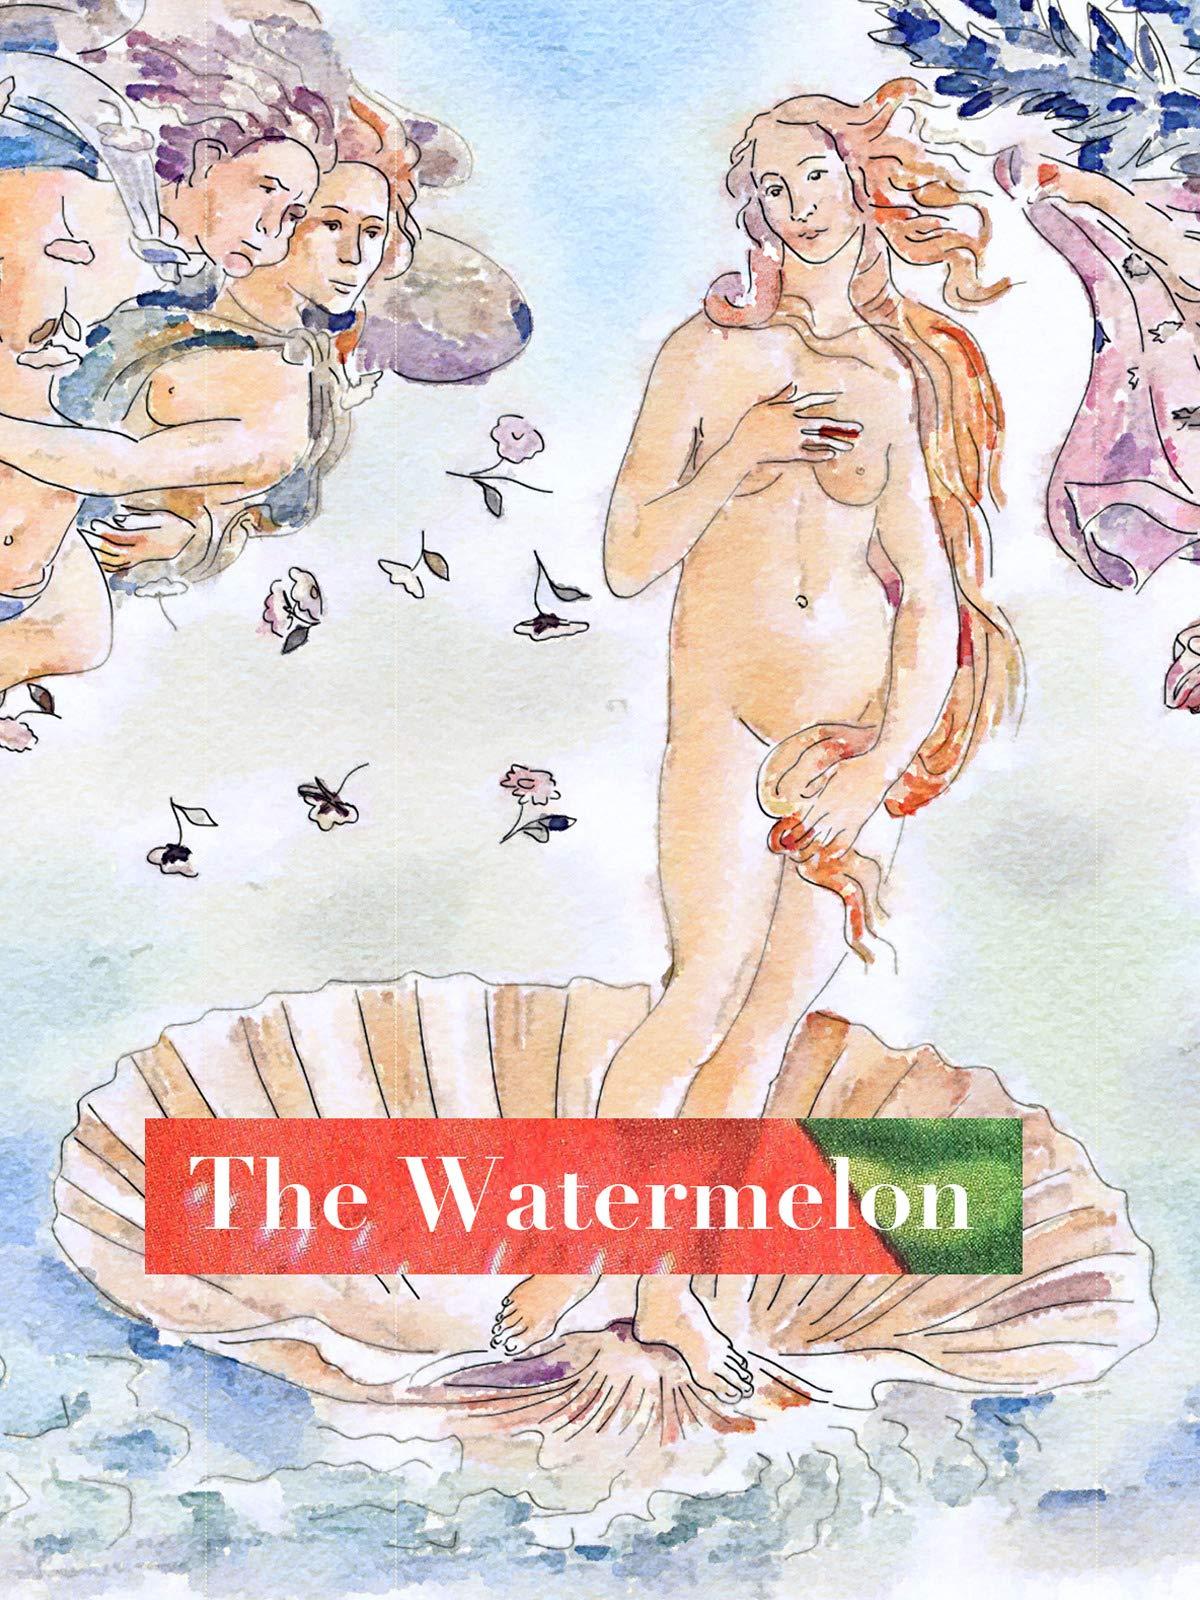 The Watermelon